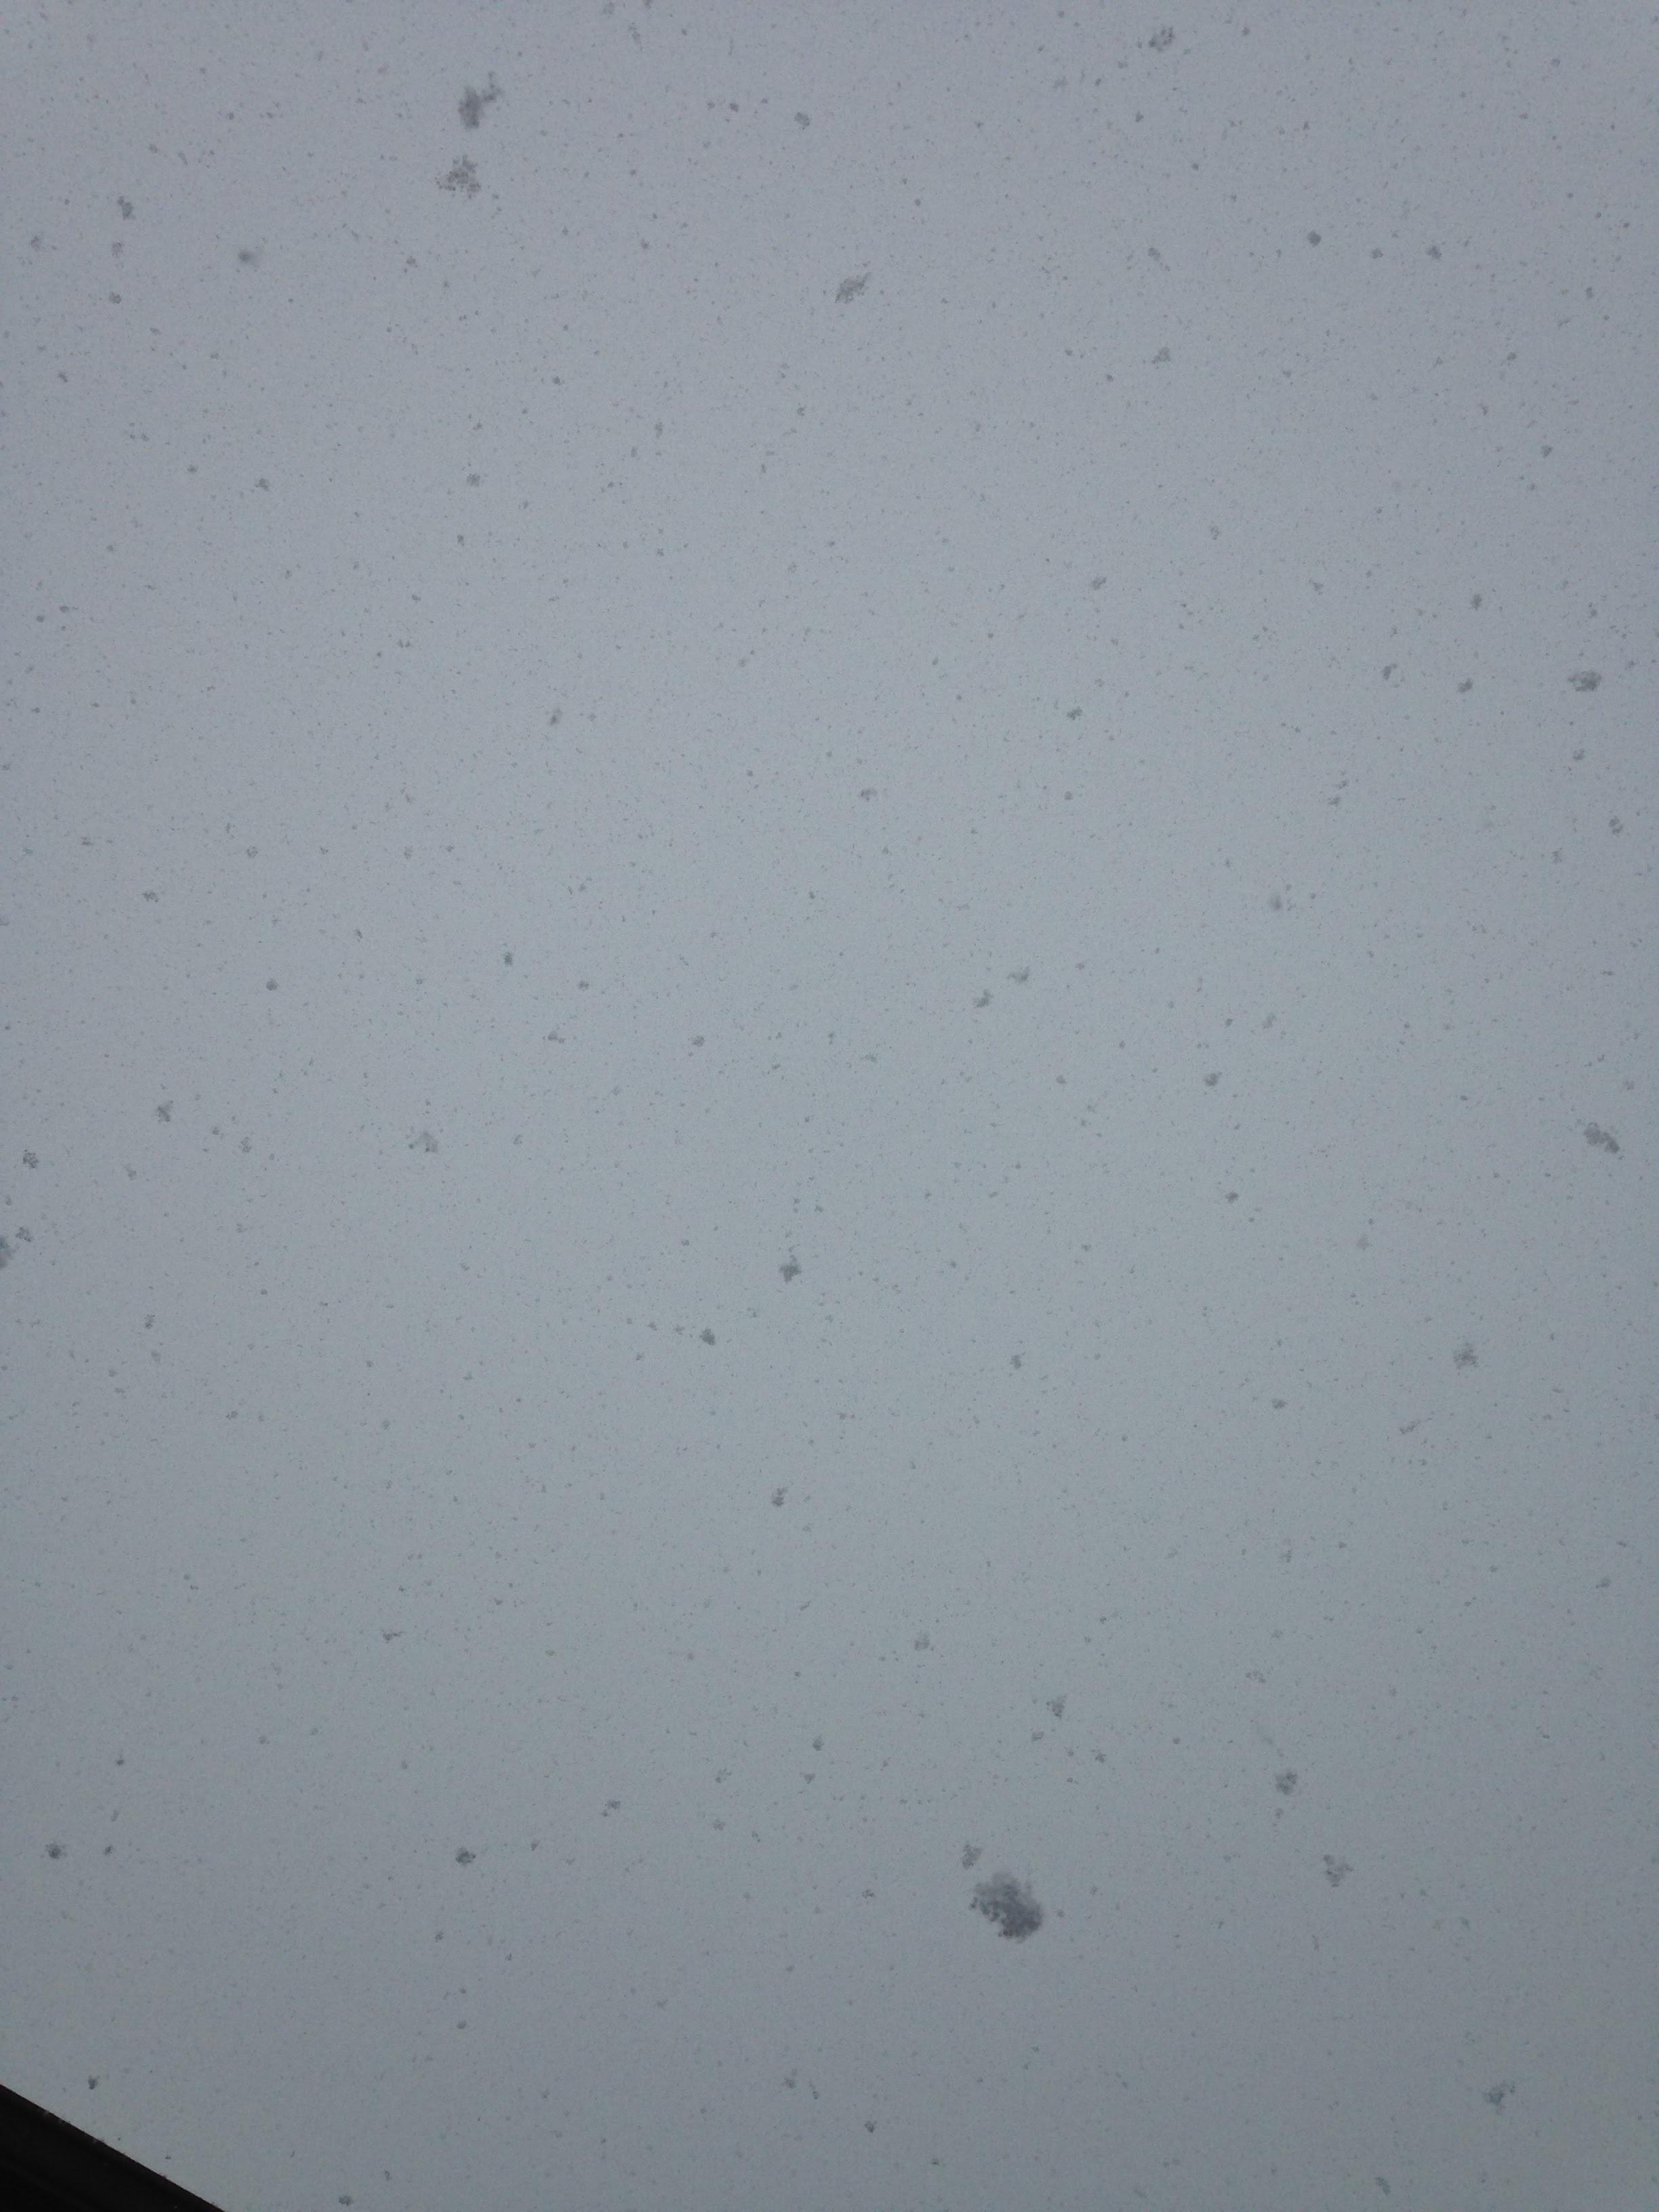 Falling-Snow.jpg